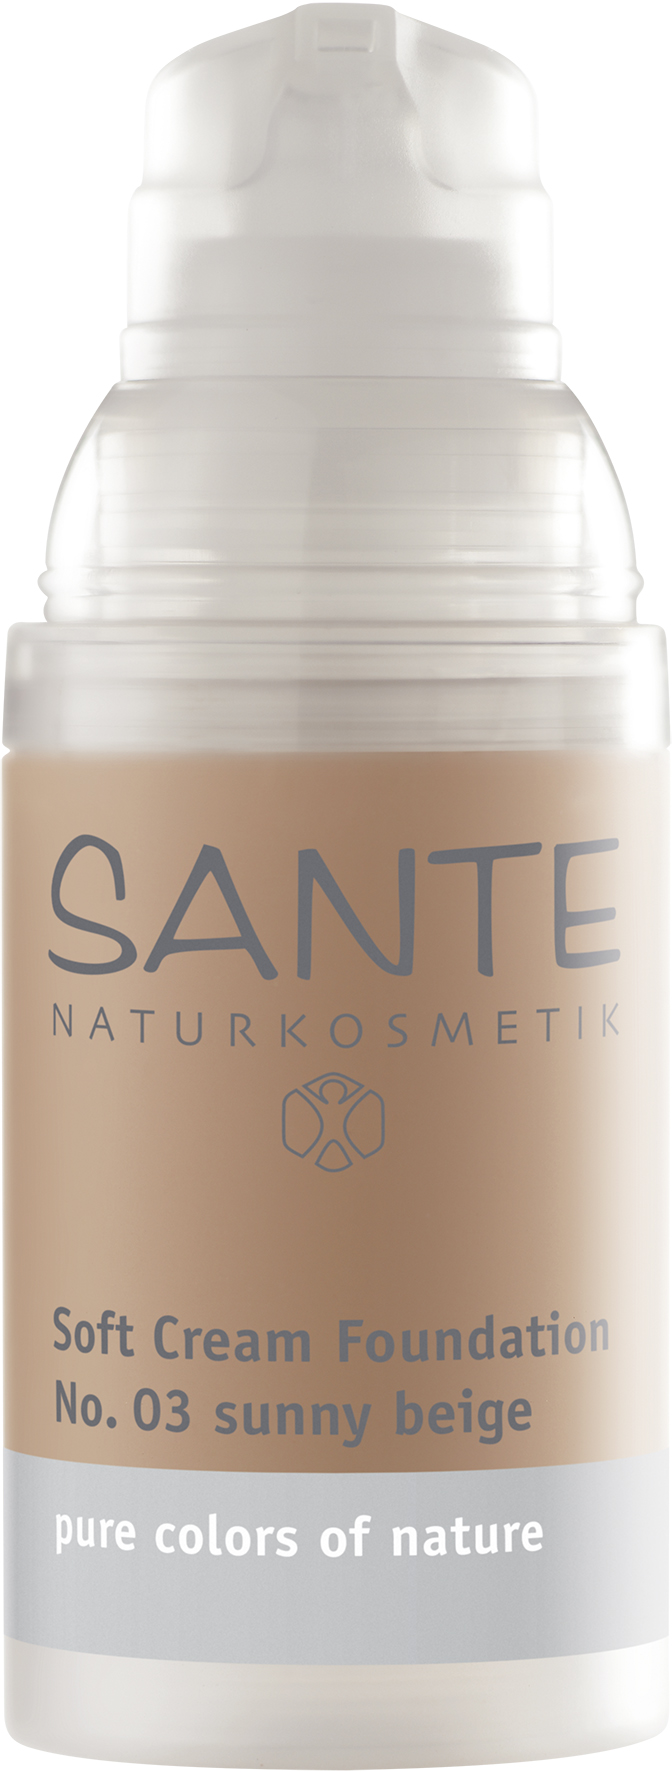 03 >> Soft Cream Foundation Sunny Beige No 03 Sante Natural Cosmetics